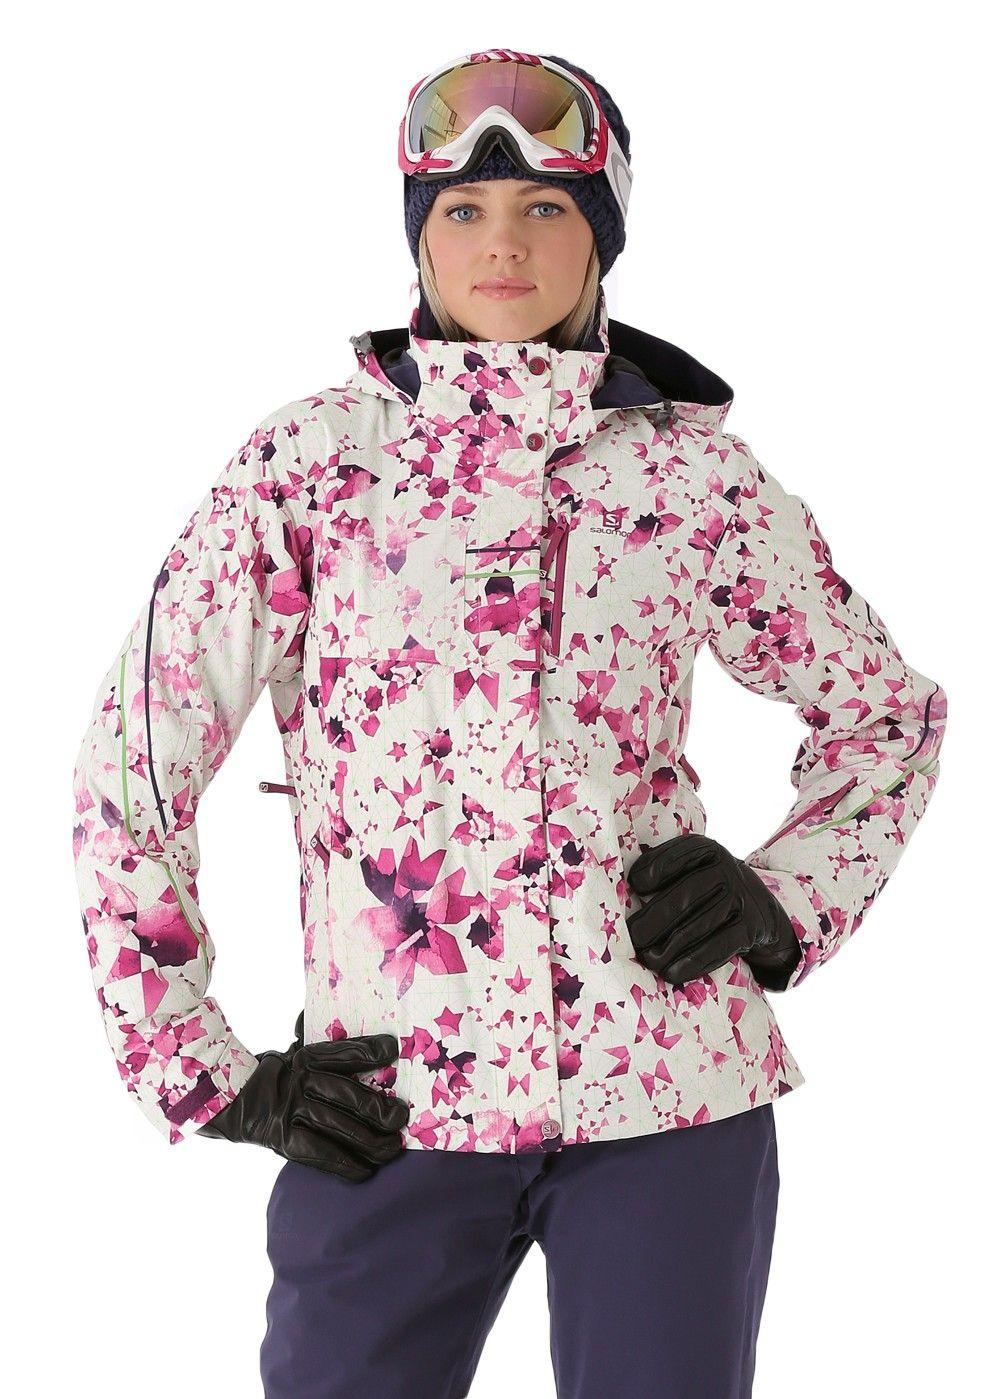 15300422e Salomon Women's Brilliant Jacket (White/Wild Berry) Ski Jackets Women's  Jackets